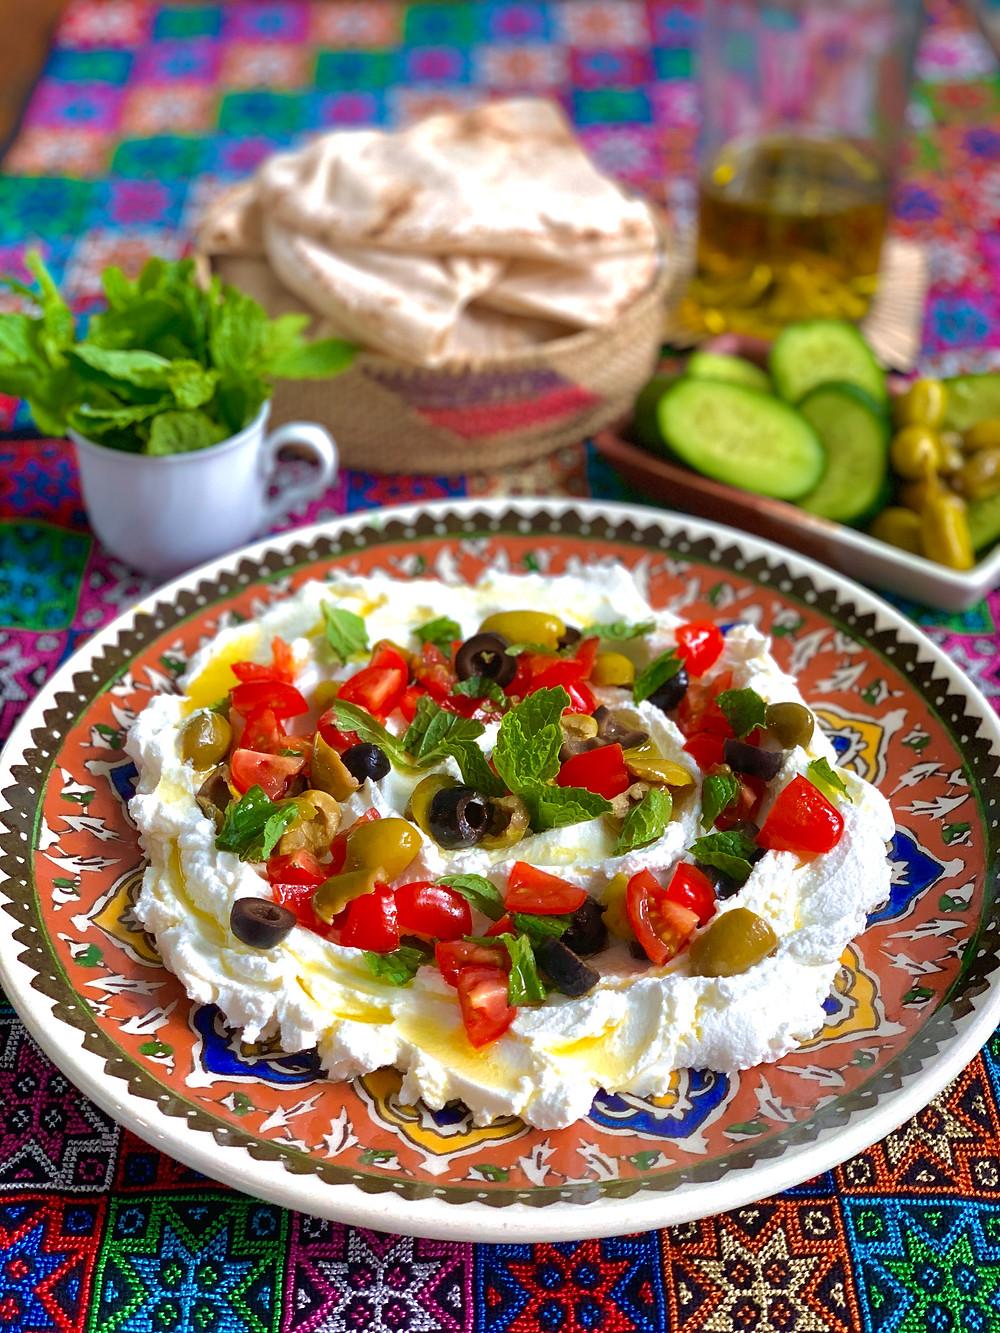 Creamy Homemade Labneh